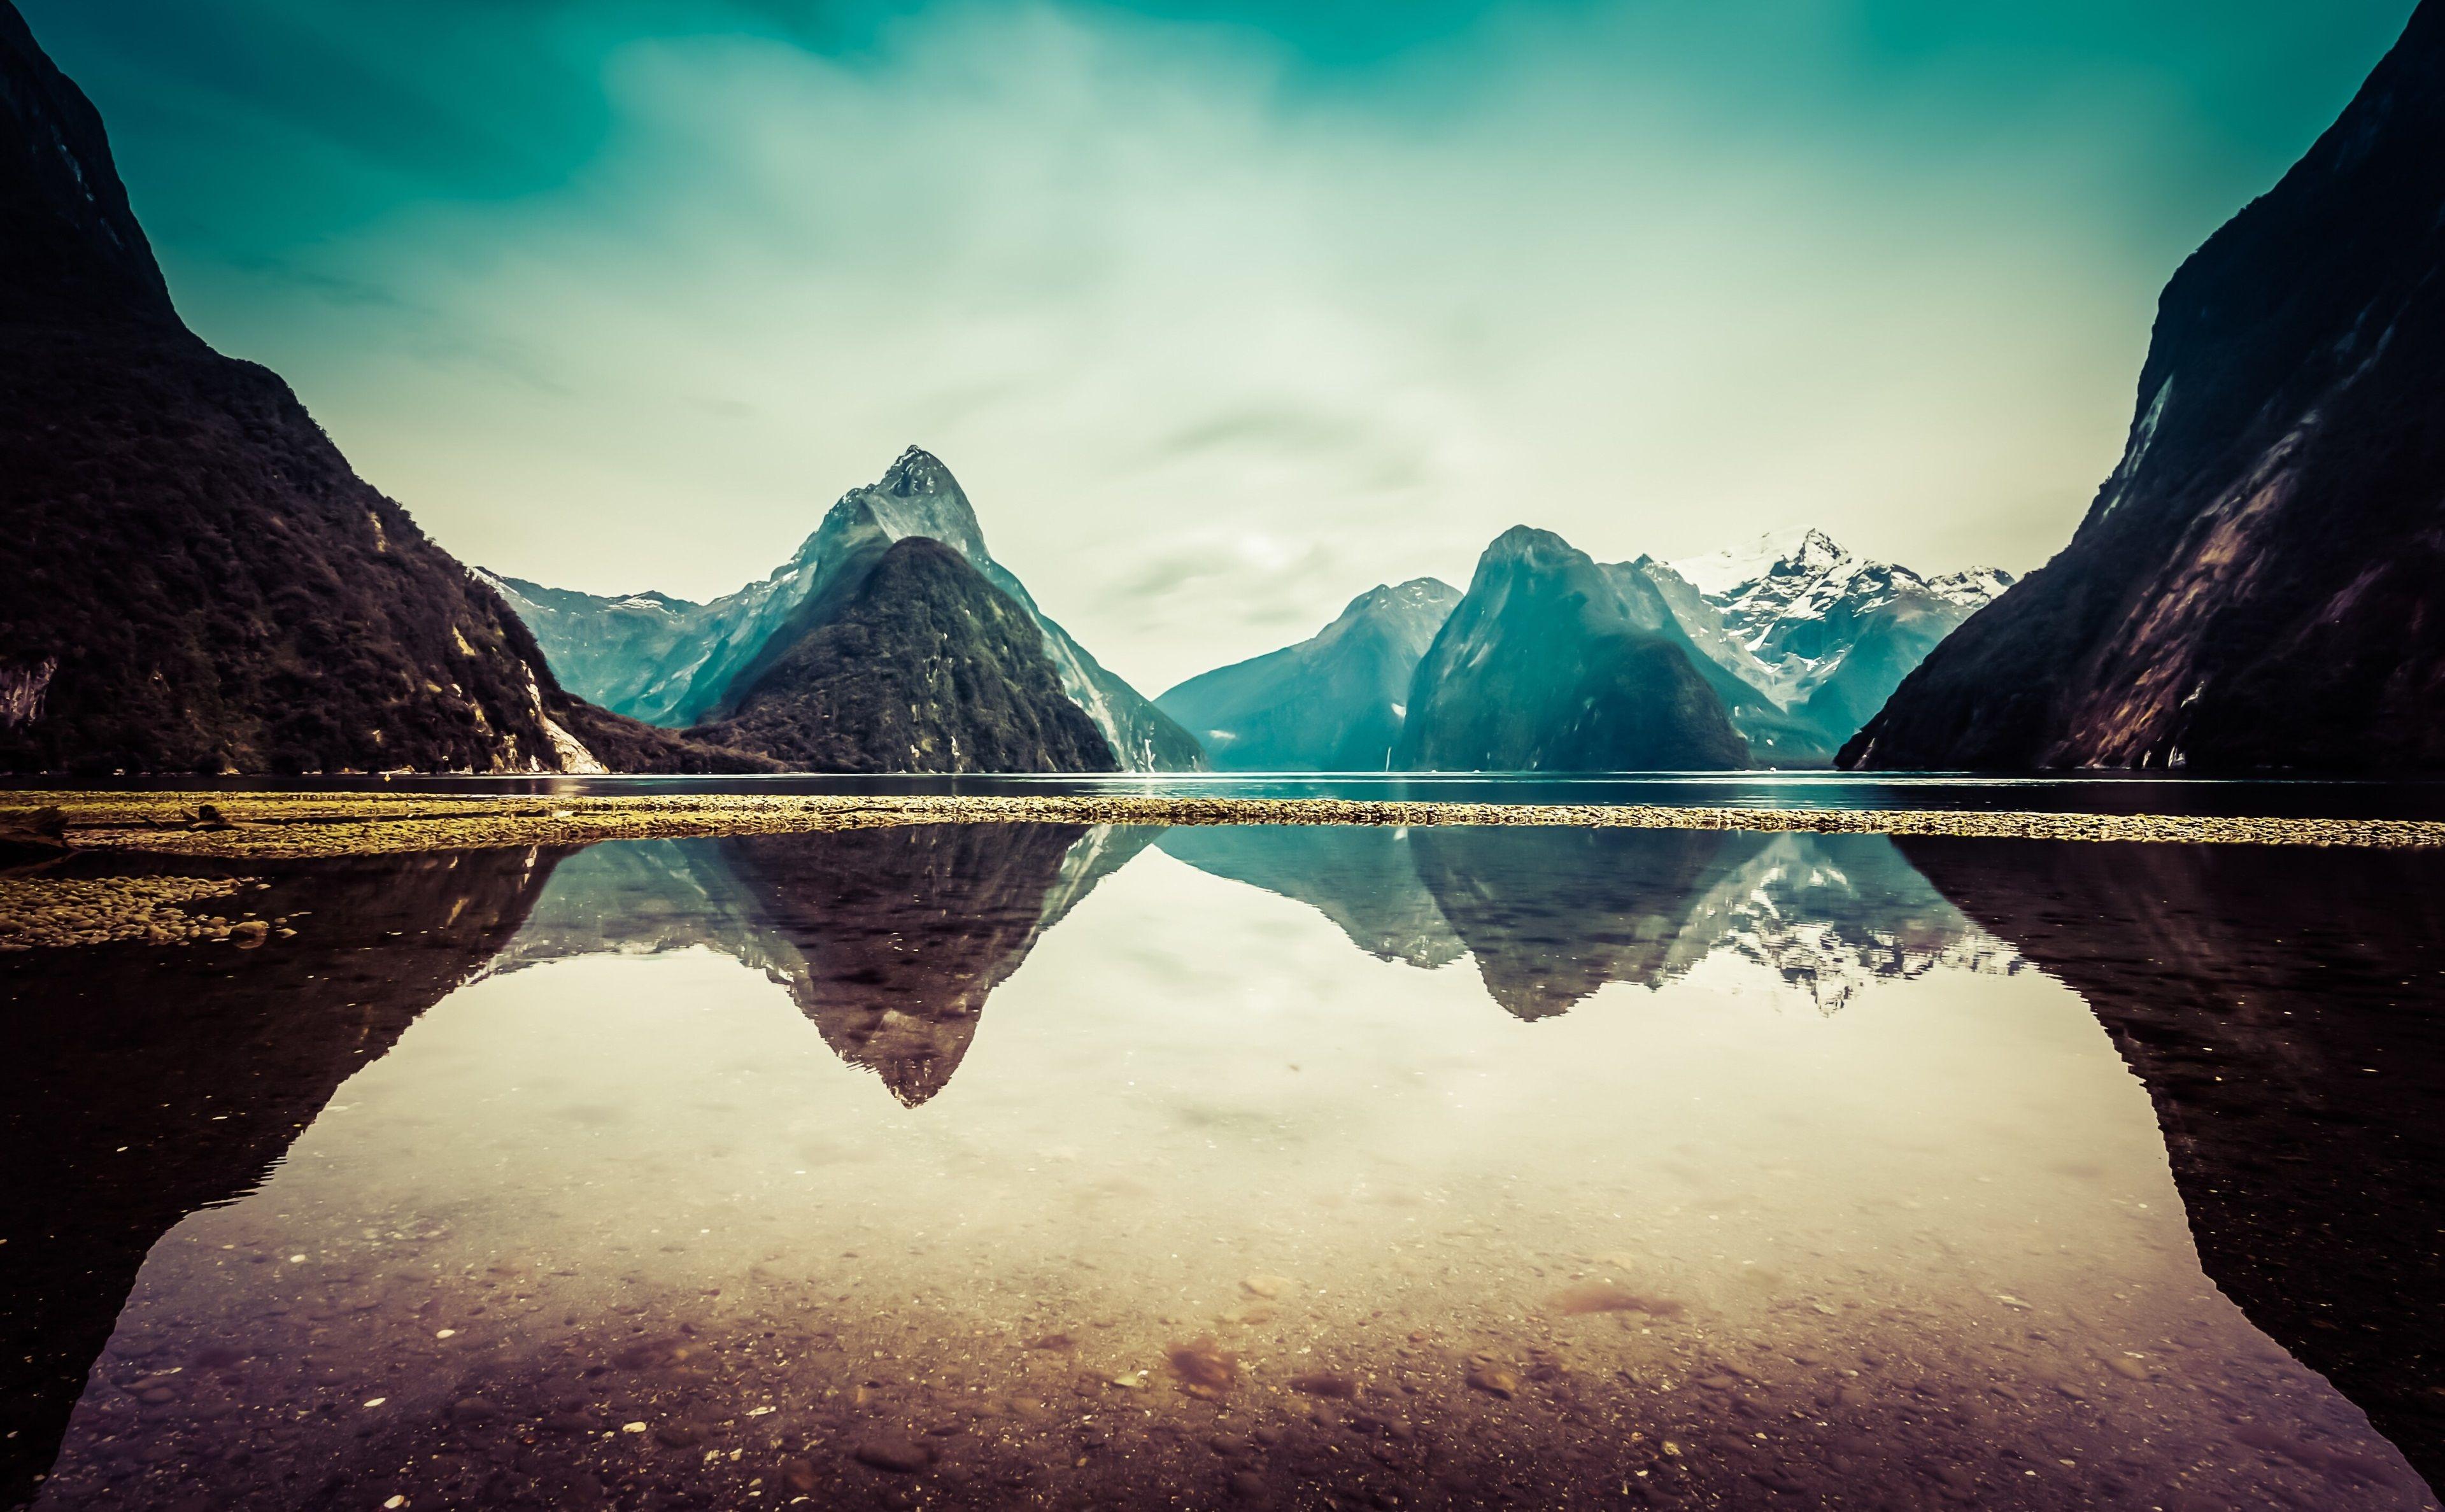 3840x2375 New Zealand 4k Free Pc Hd Wallpaper Cool Desktop Backgrounds Landscape 4k Wallpapers For Pc